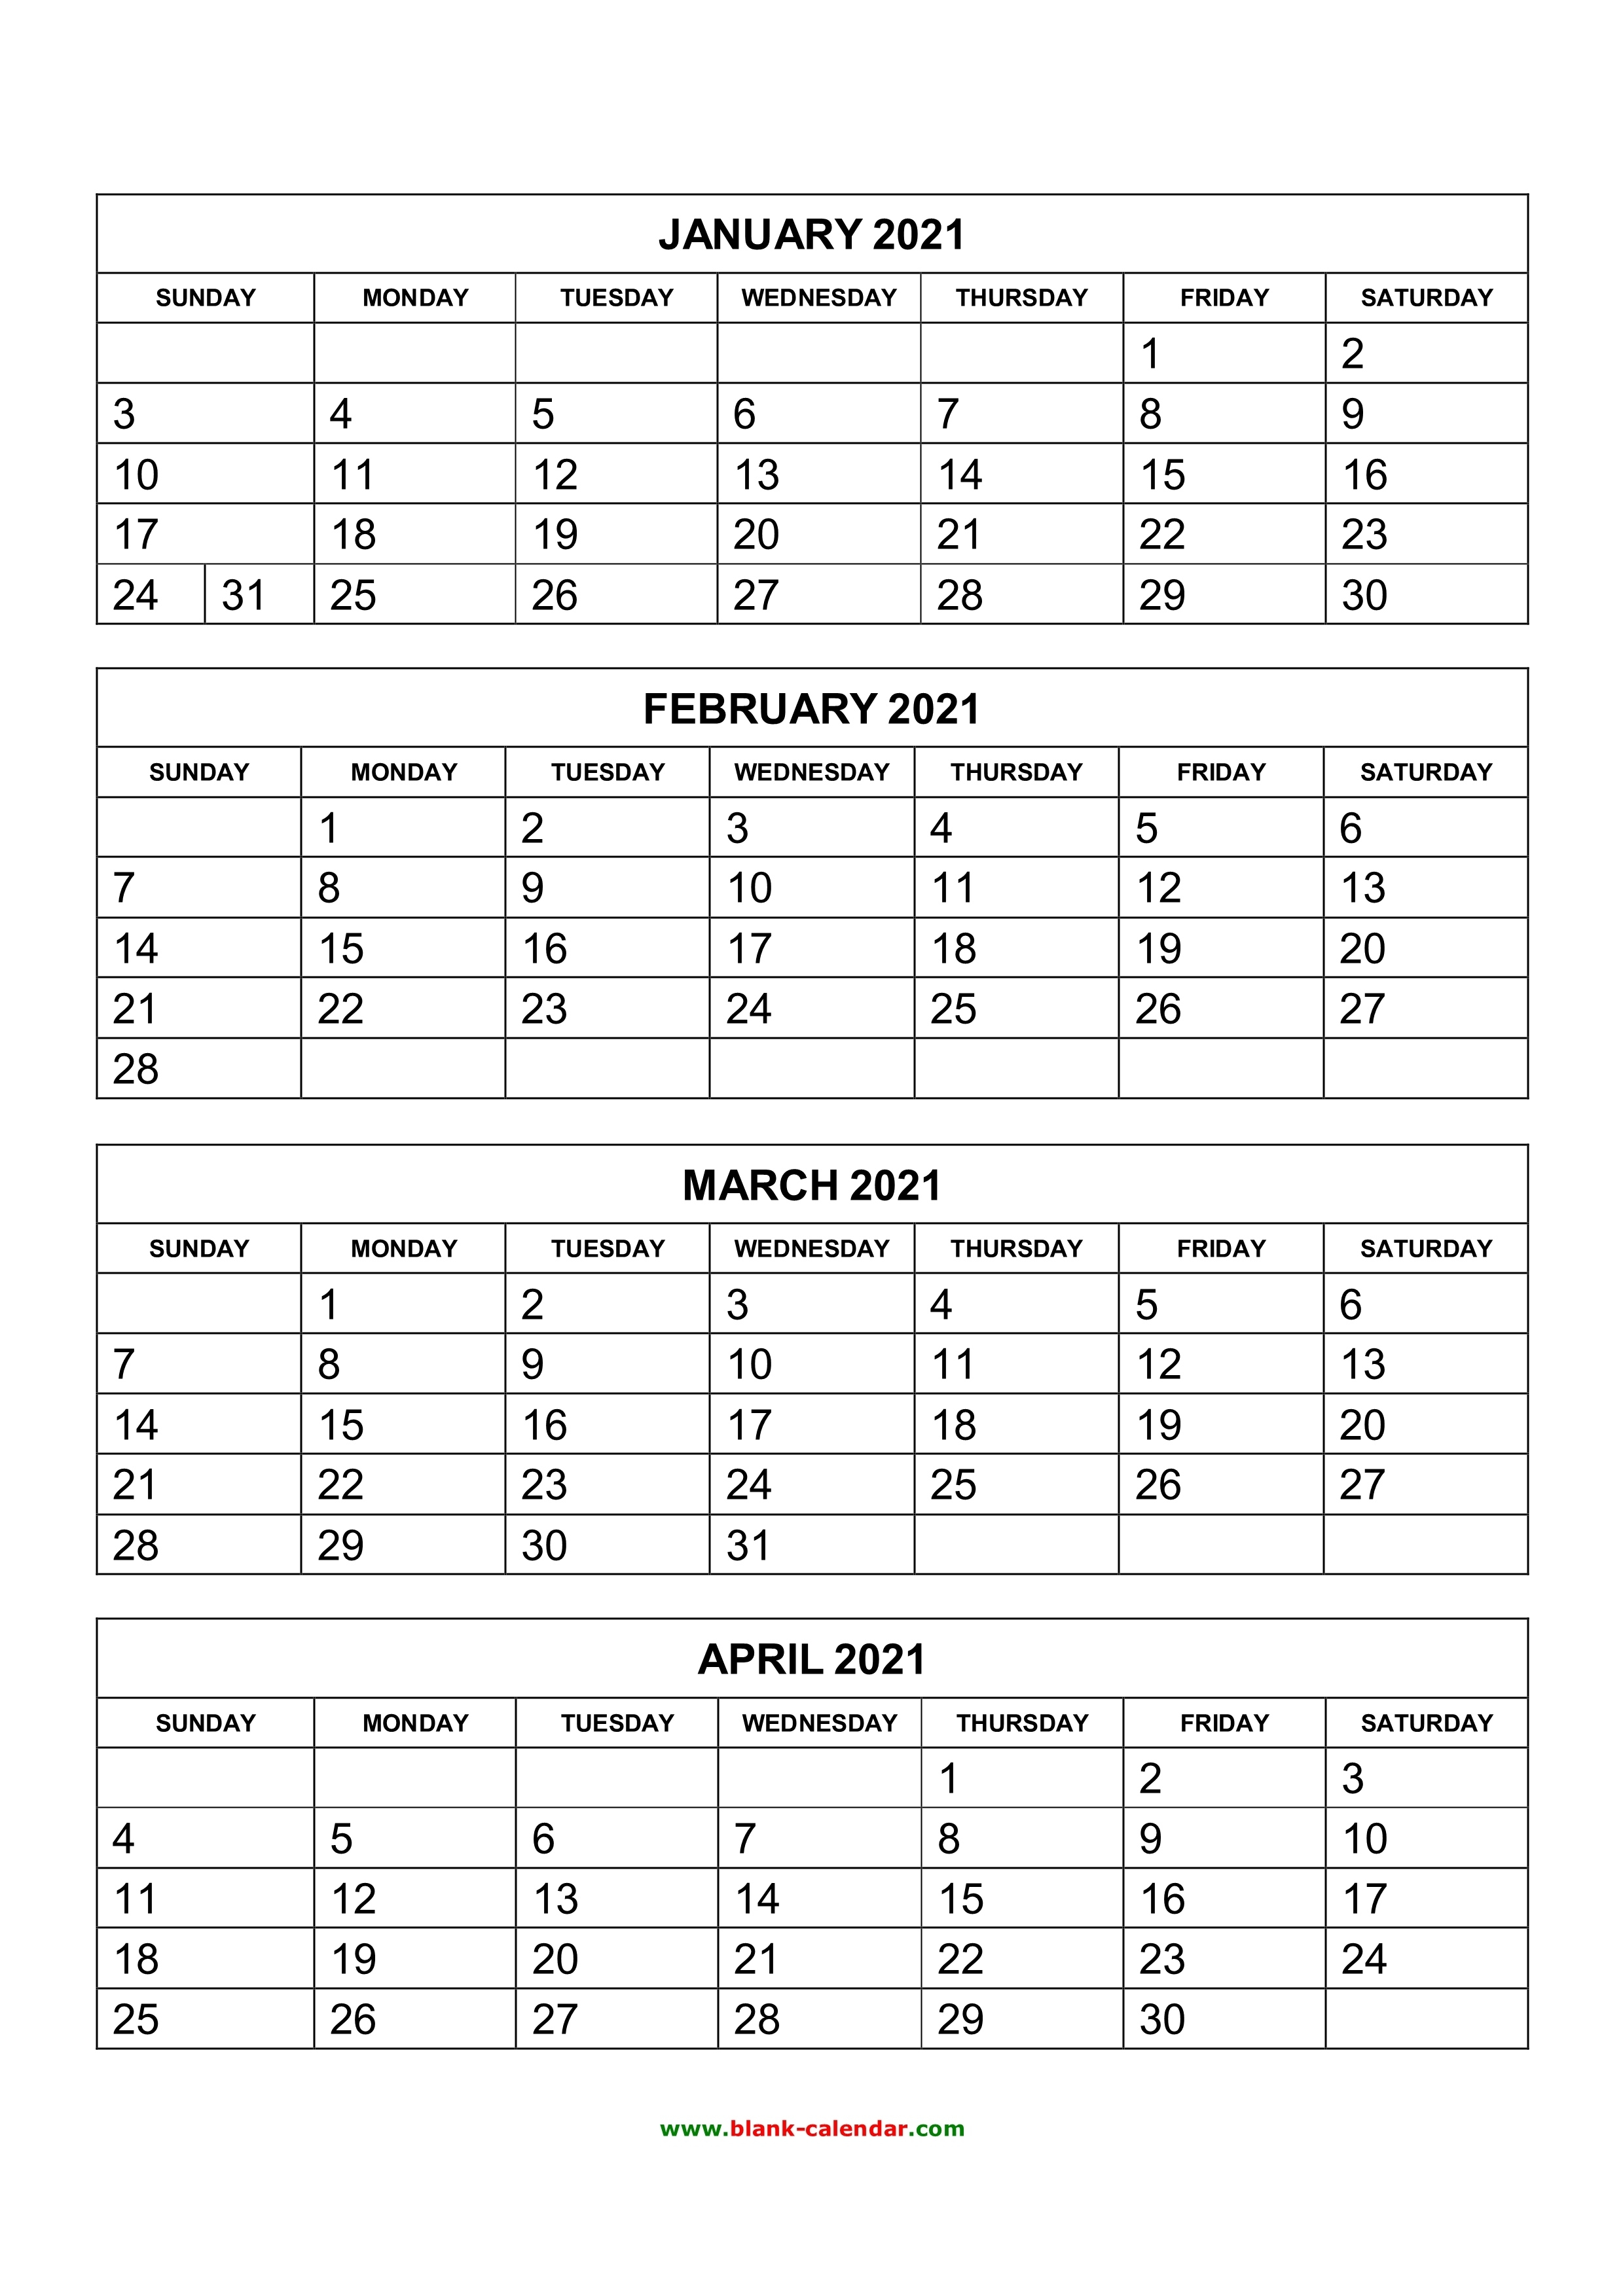 Free Download Printable Calendar 2021, 4 Months Per Page, 3 Printable 3 Months At A Time Calendar 2021